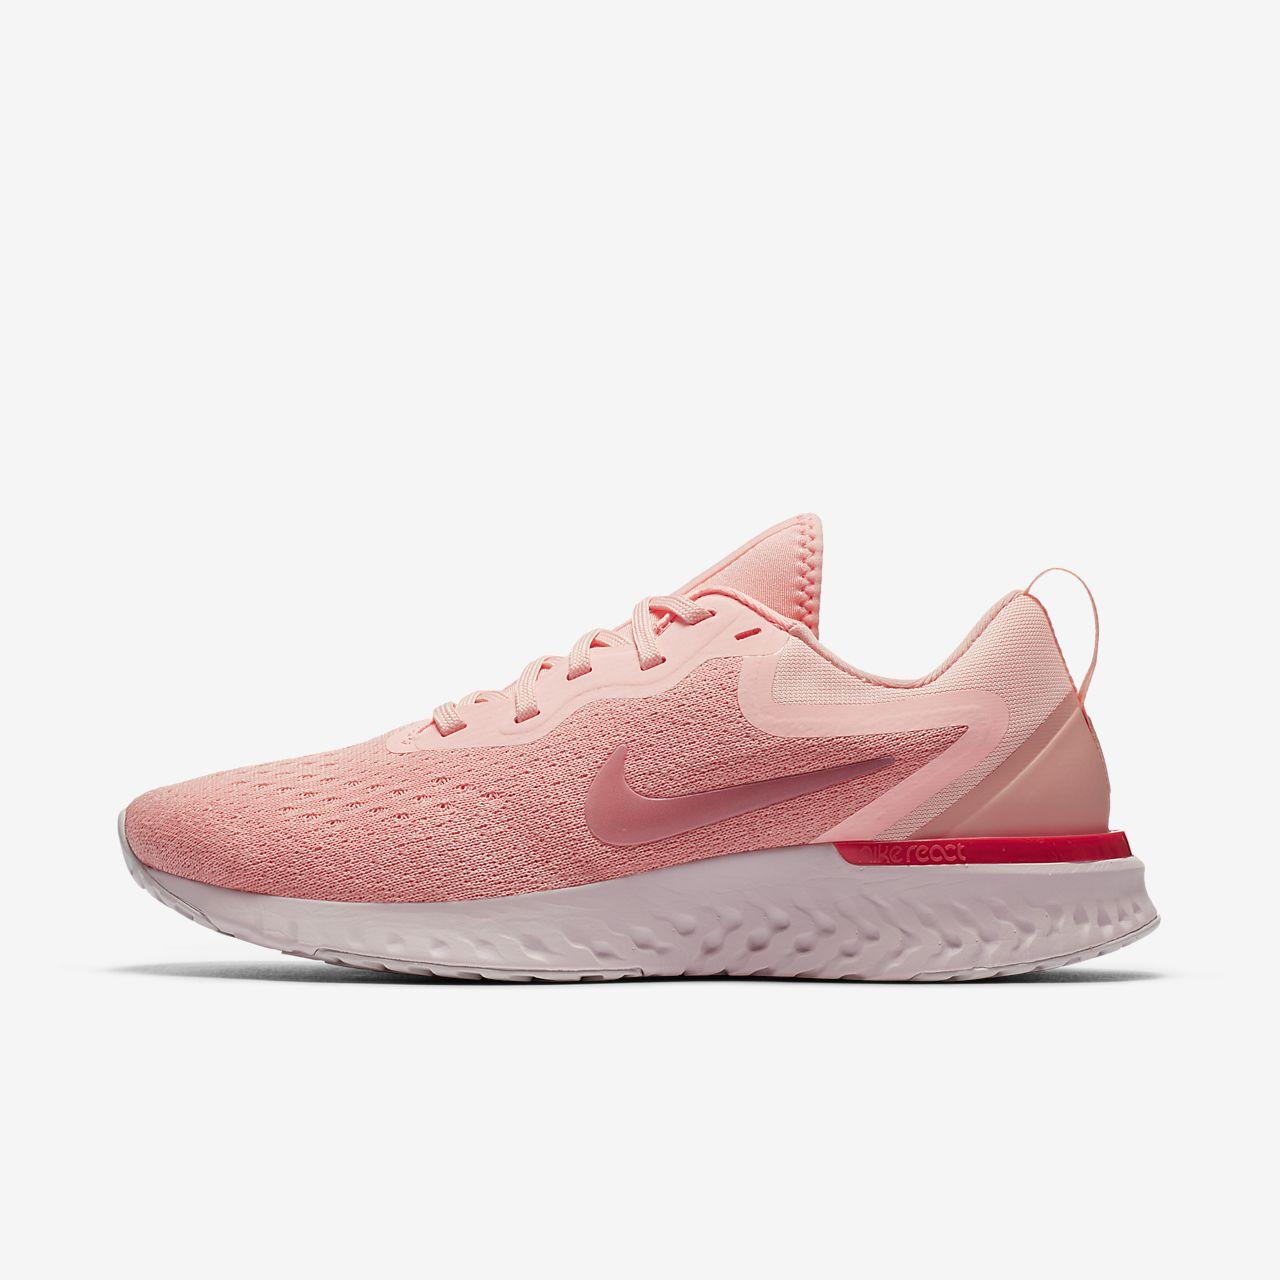 b24471a4d80 ... sweden nike odyssey react womens running shoe 93efa 0b4b1